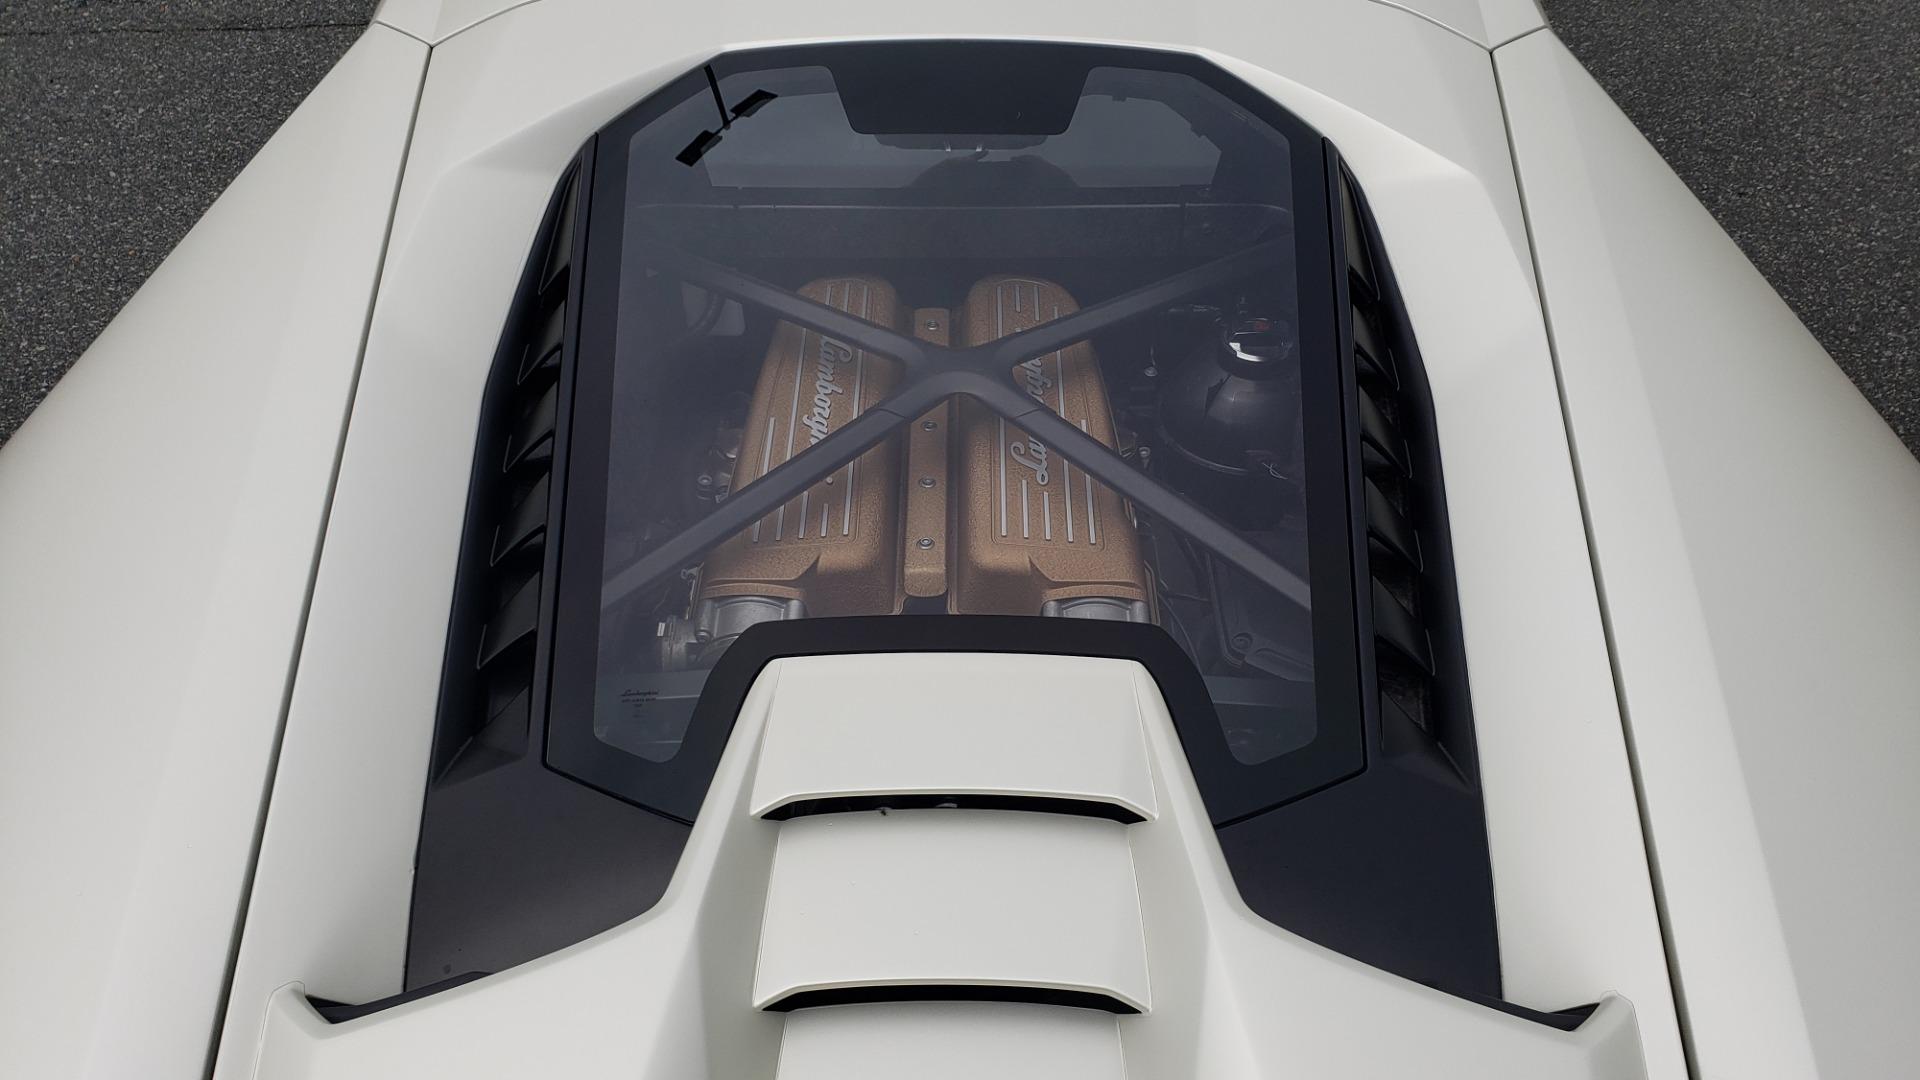 Used 2018 Lamborghini HURACAN PERFORMANTE 5.2L V10 / 630HP / 7-SPD AUTO / AWD / NAV / PREM SND for sale $269,995 at Formula Imports in Charlotte NC 28227 24